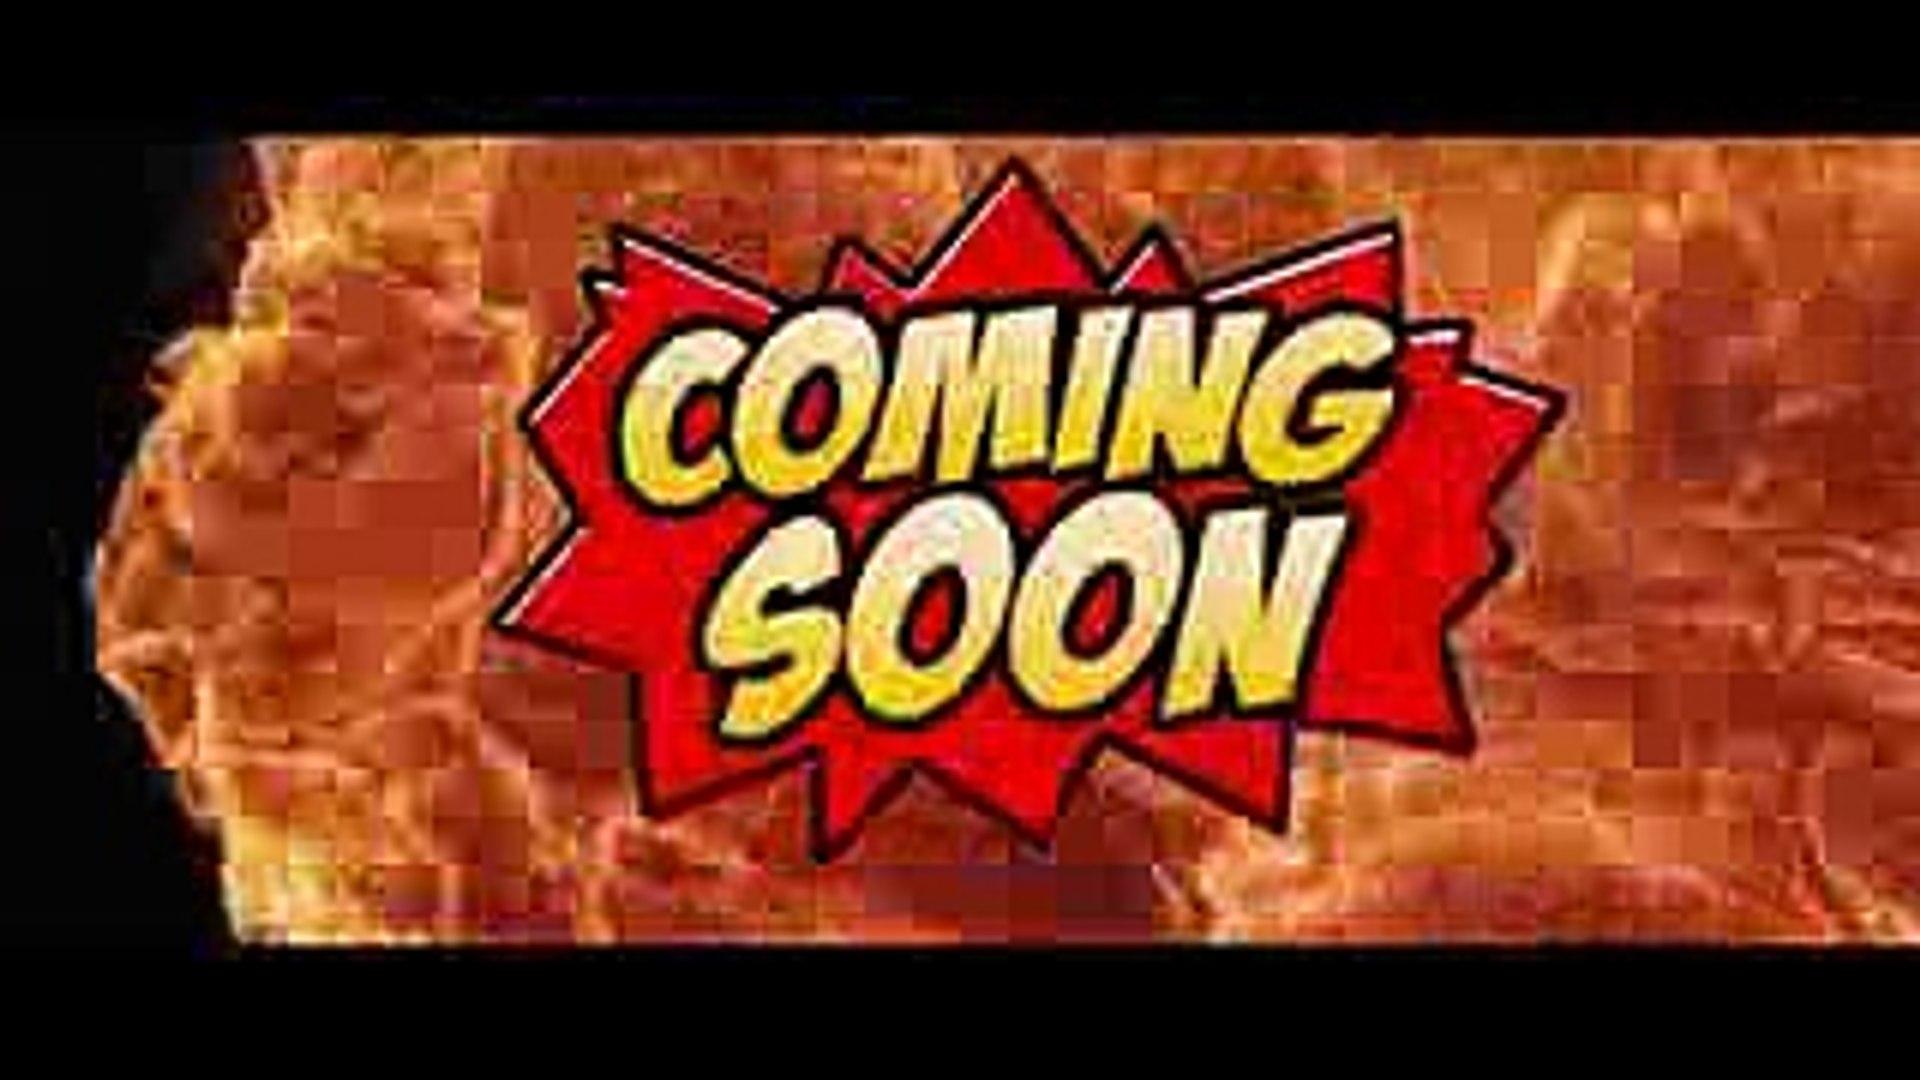 Драка в блоке 99 (2017) - Трейлер  Brawl in Cell Block 99 (2017) - Trailer  Coming Soon